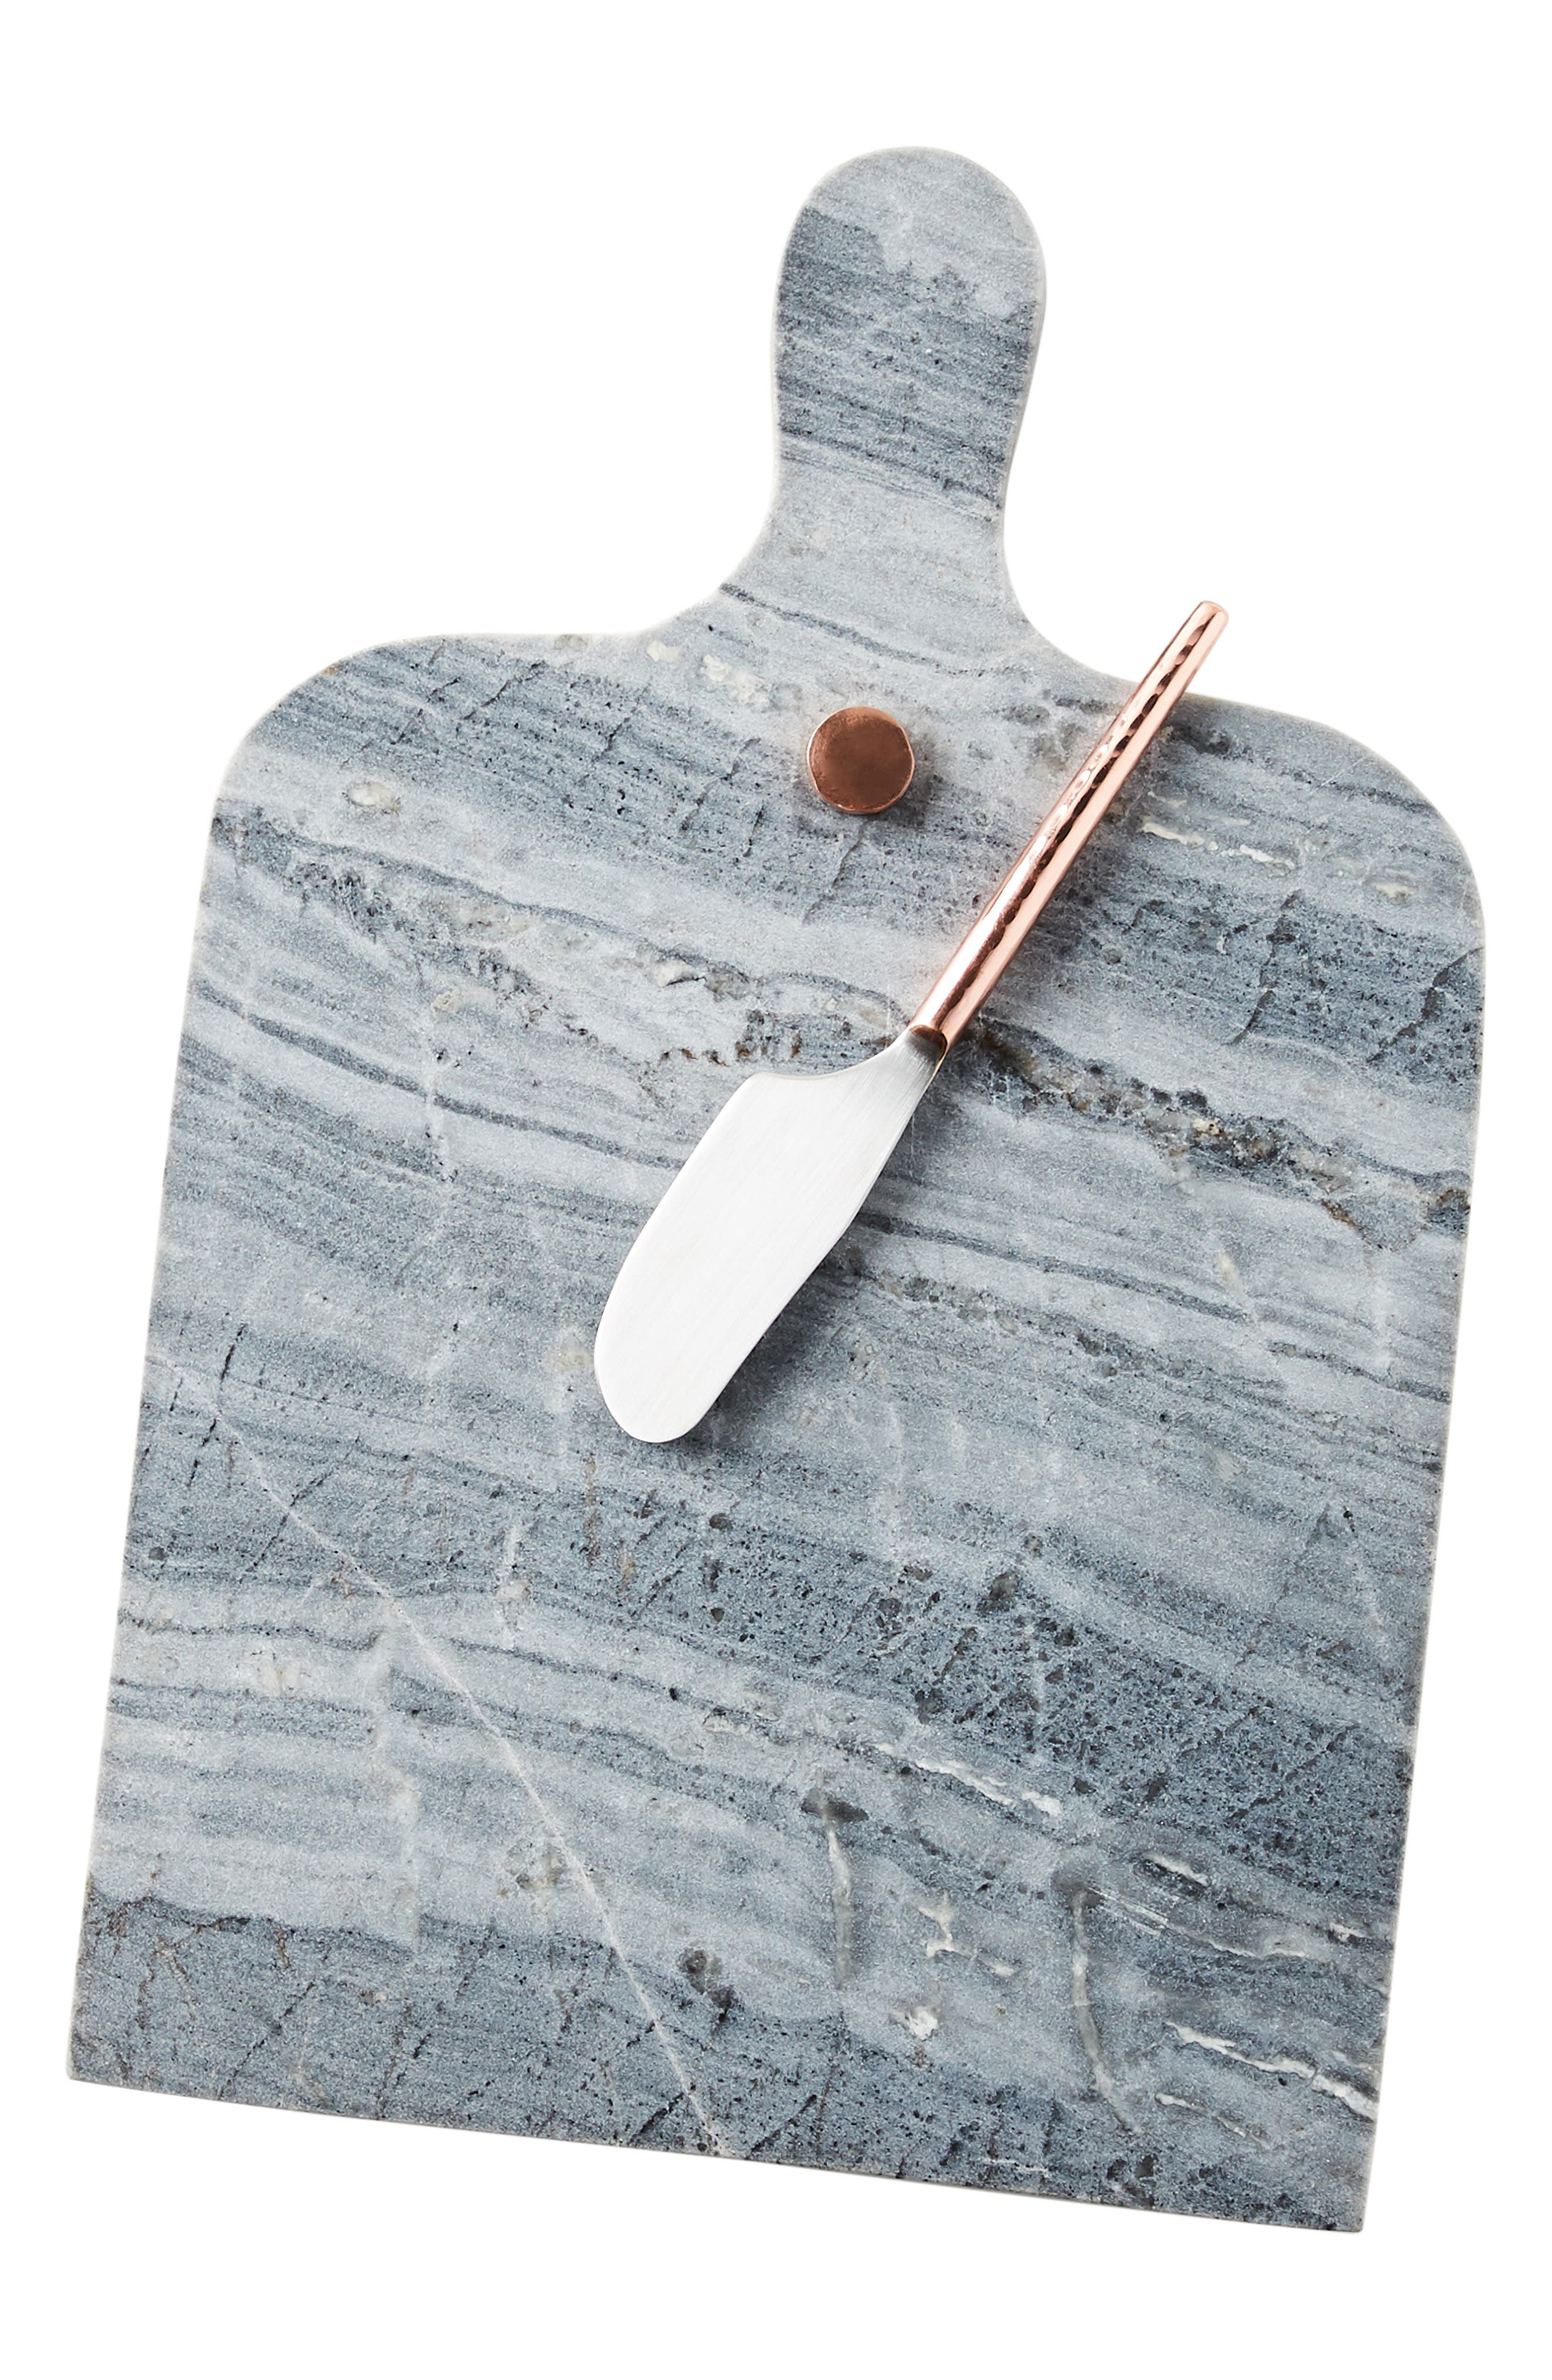 Swivel Cheeseboard & Set of 3 Knives,                             Alternate thumbnail 3, color,                             020